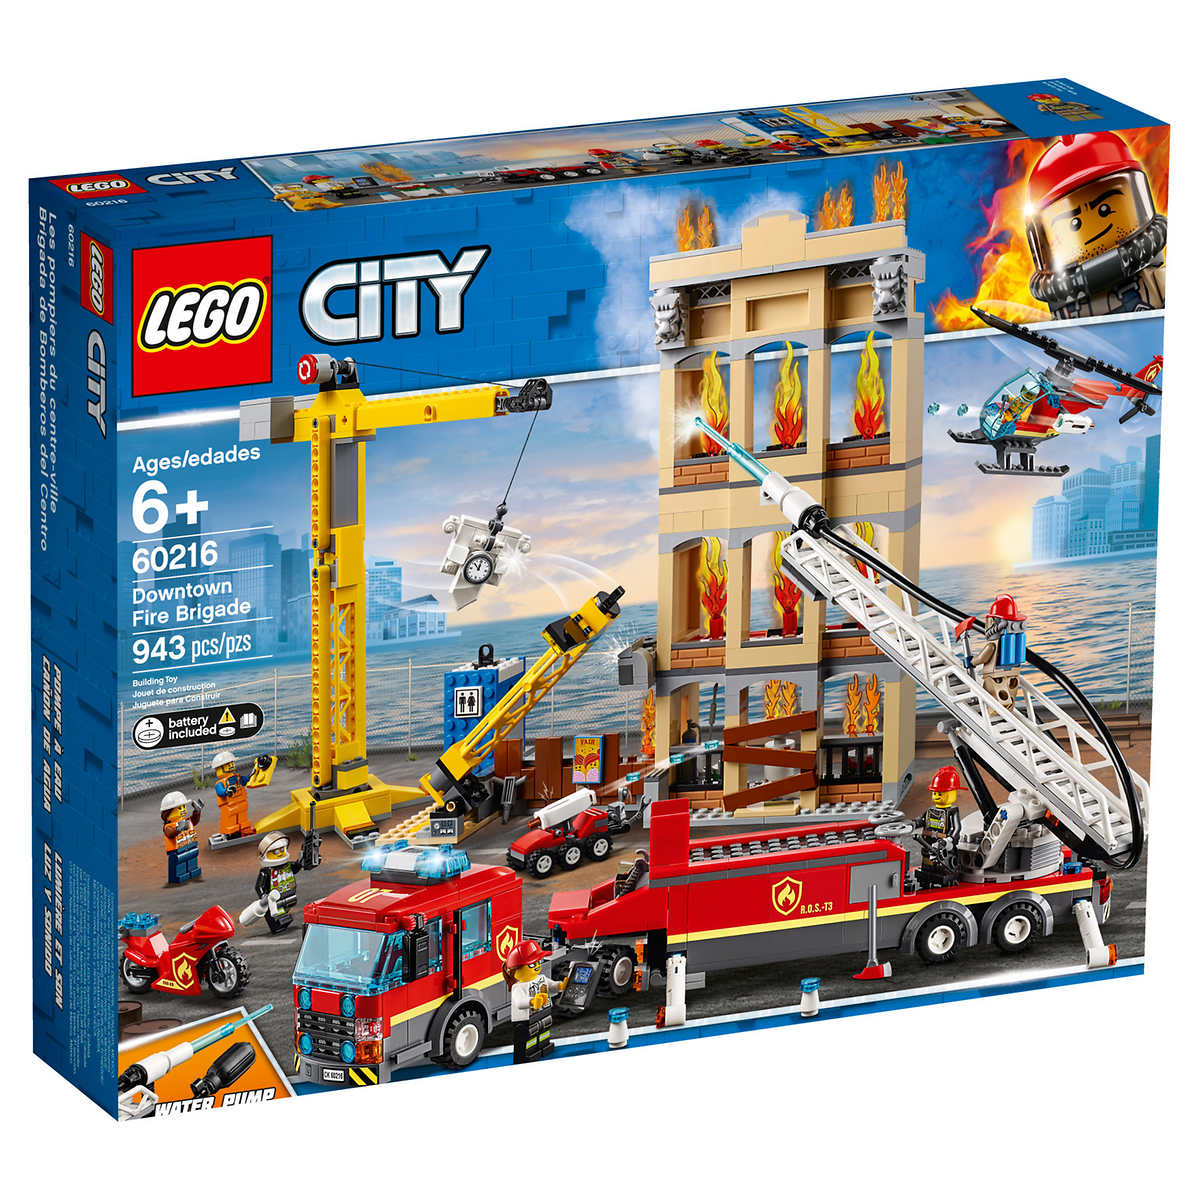 Lego Fire Downtown City City Lego Fire Brigade Downtown XNOZ8nk0wP